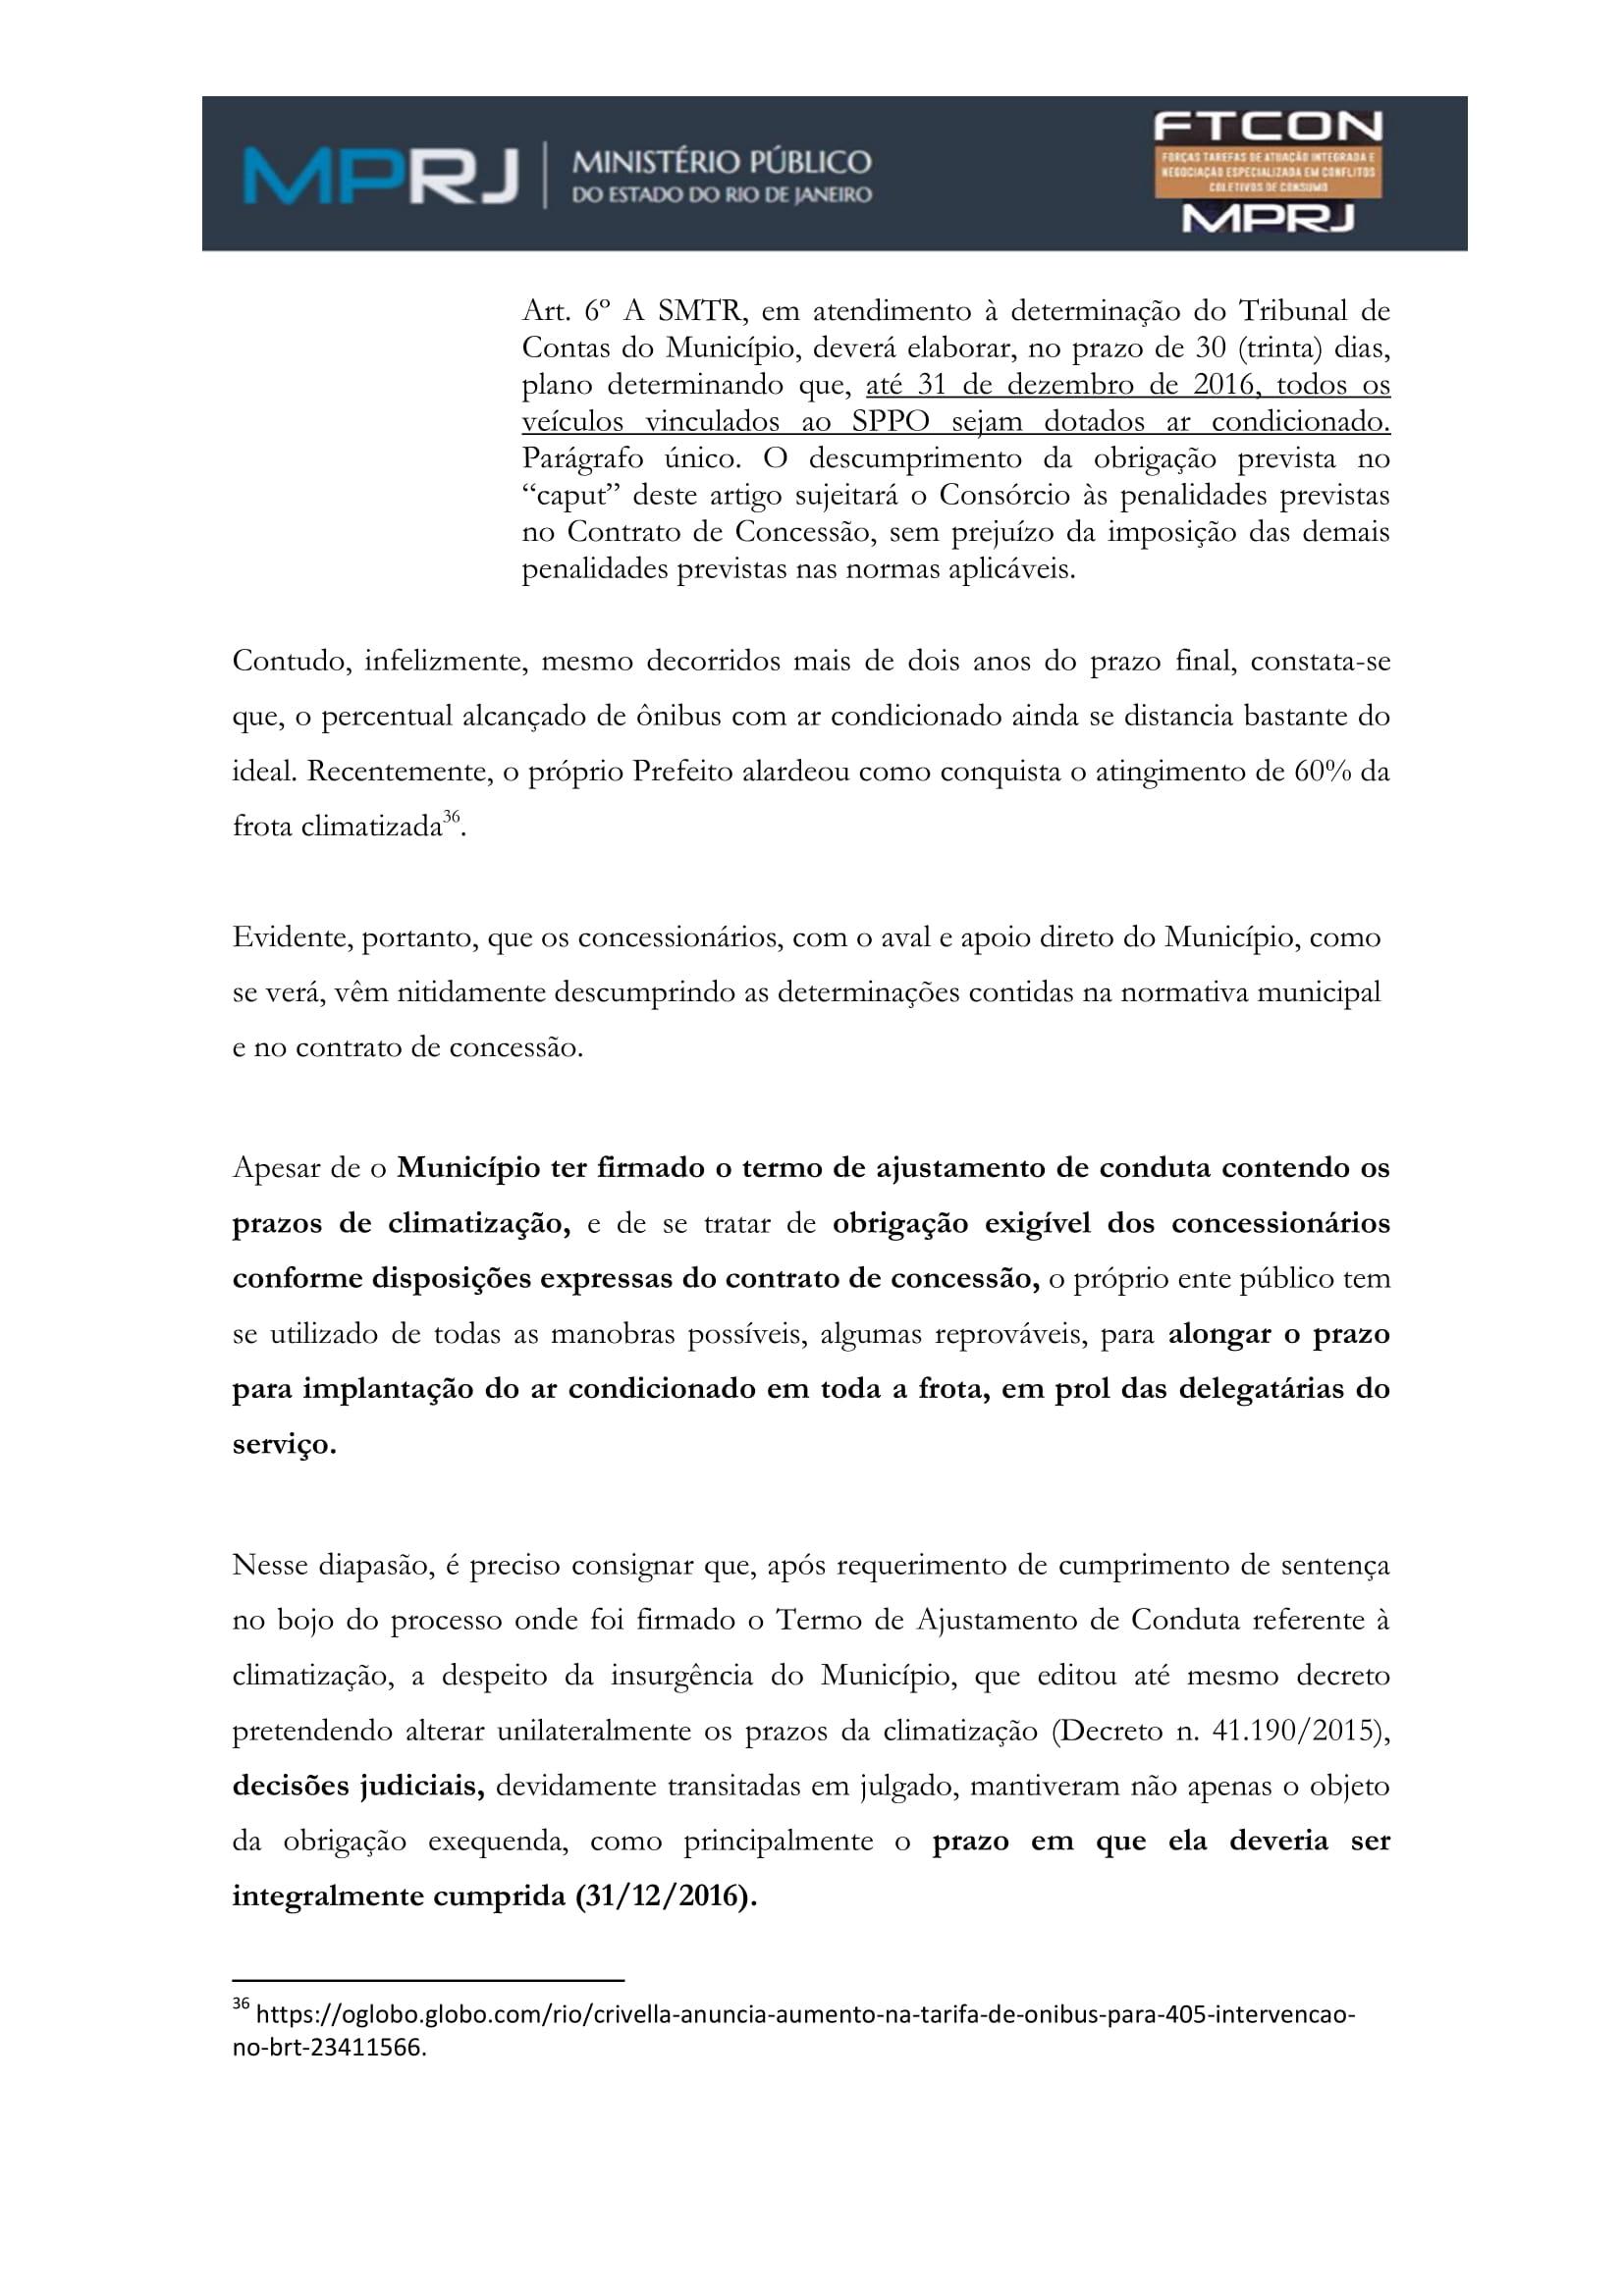 acp_caducidade_onibus_dr_rt-039